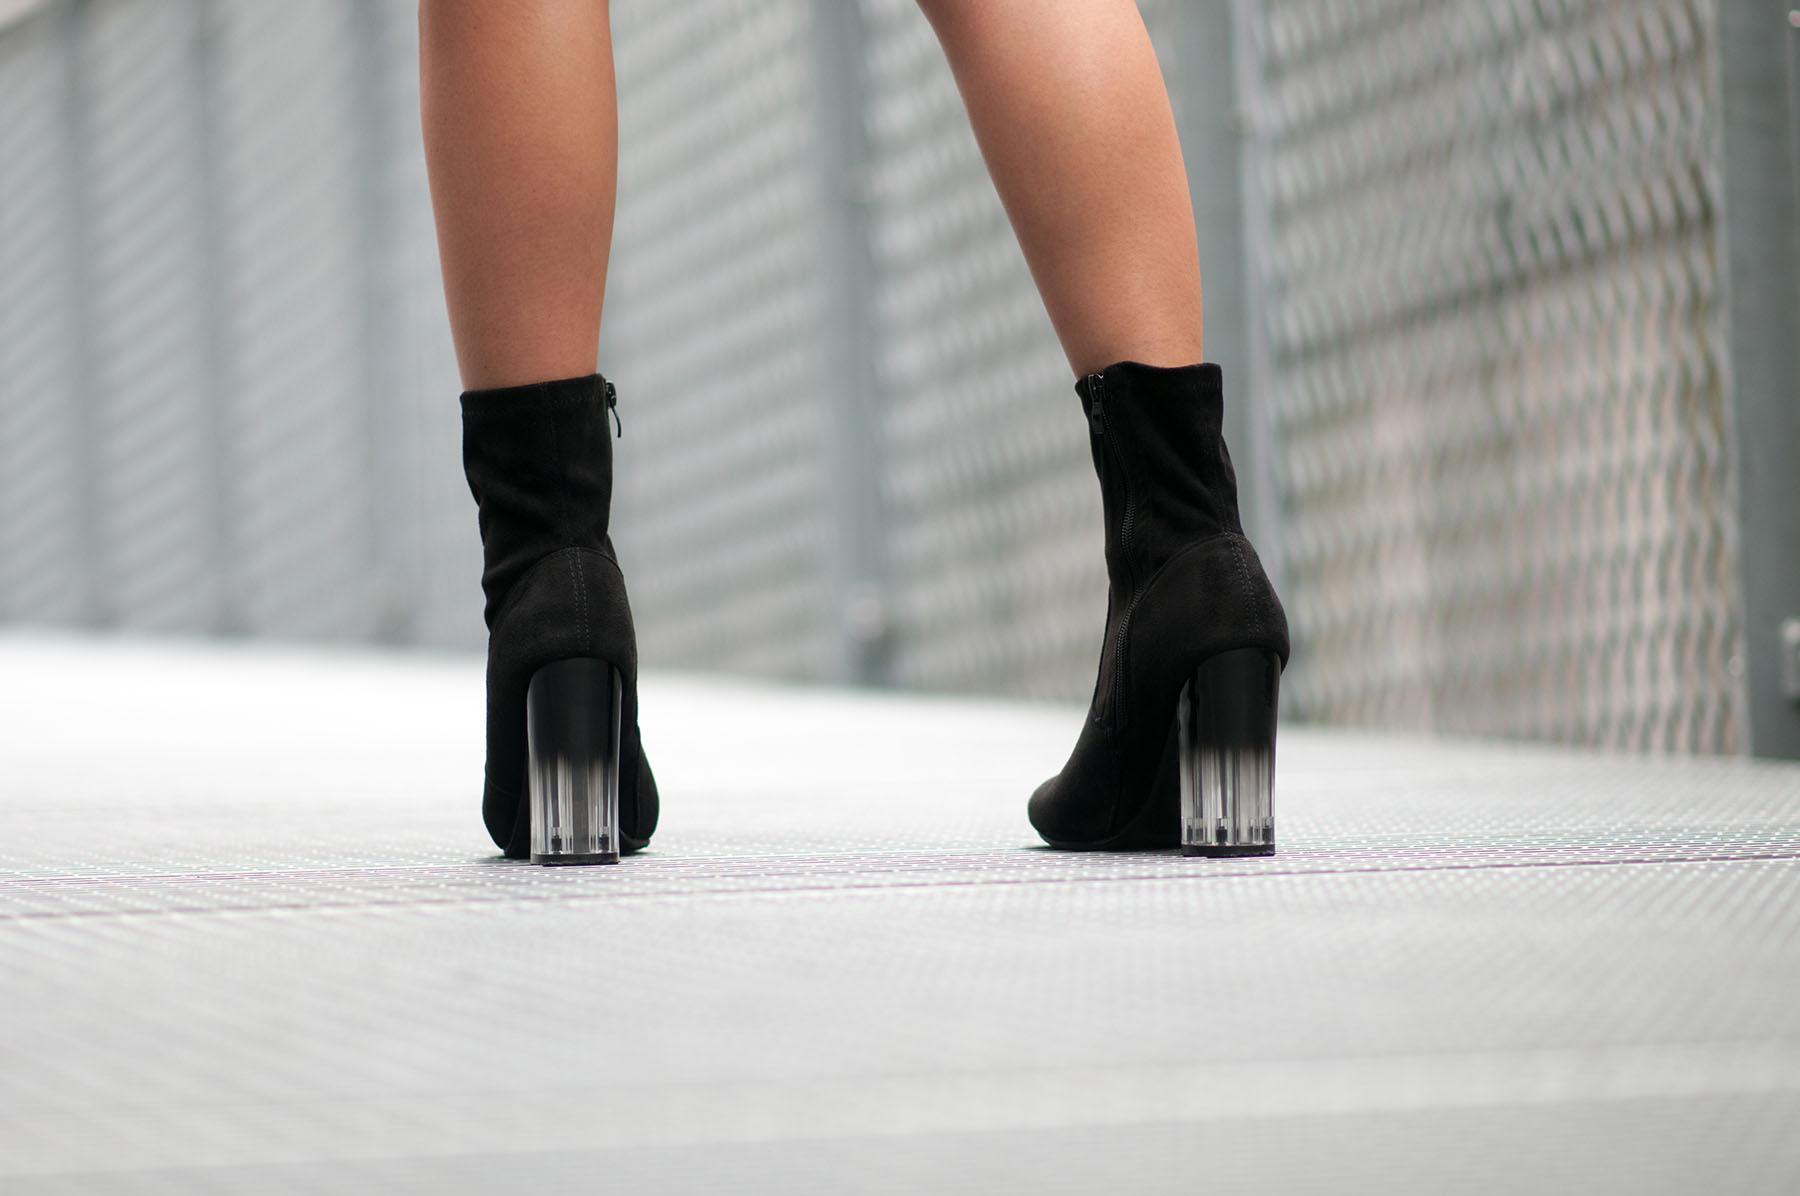 bottines-noires-a-talon-transparent-degrade-en-plexiglas-buzzao